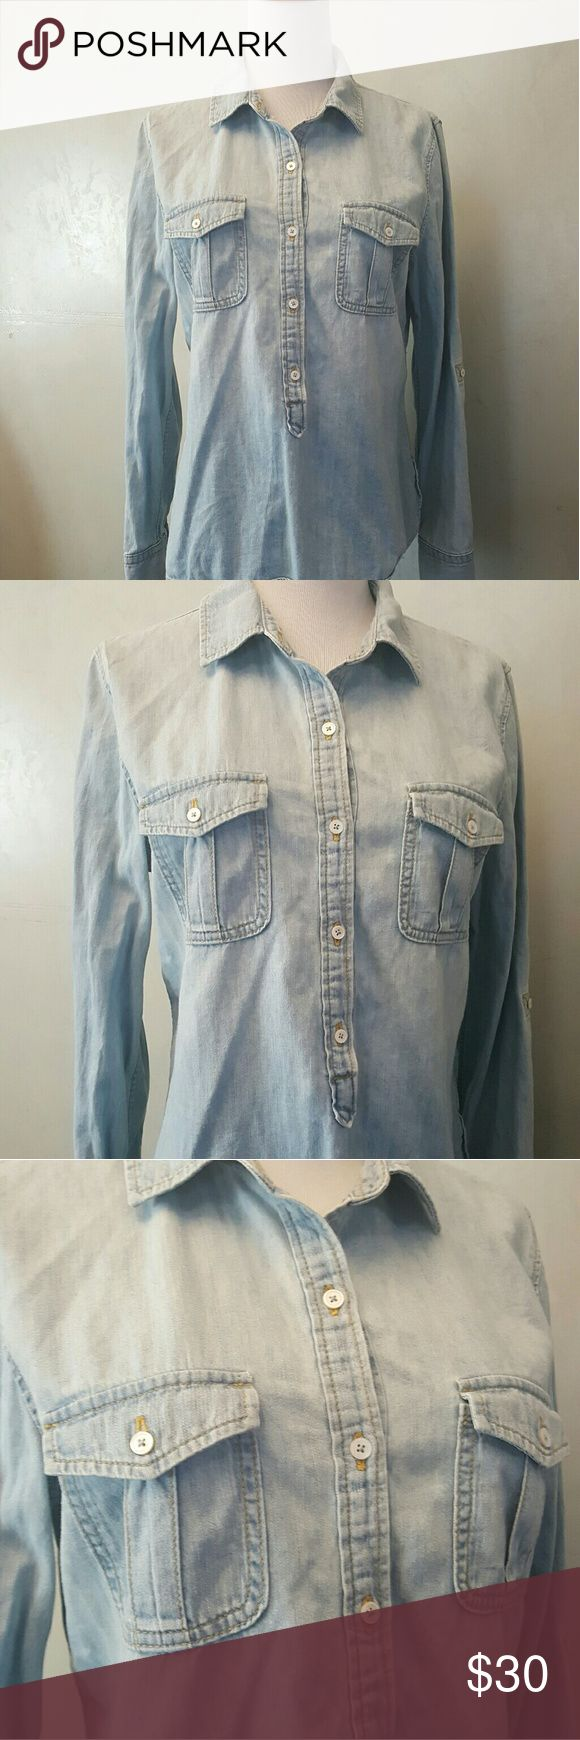 Talbots light denim shirt Talbots light denim button down shirt. In perfect condition Talbots Tops Button Down Shirts